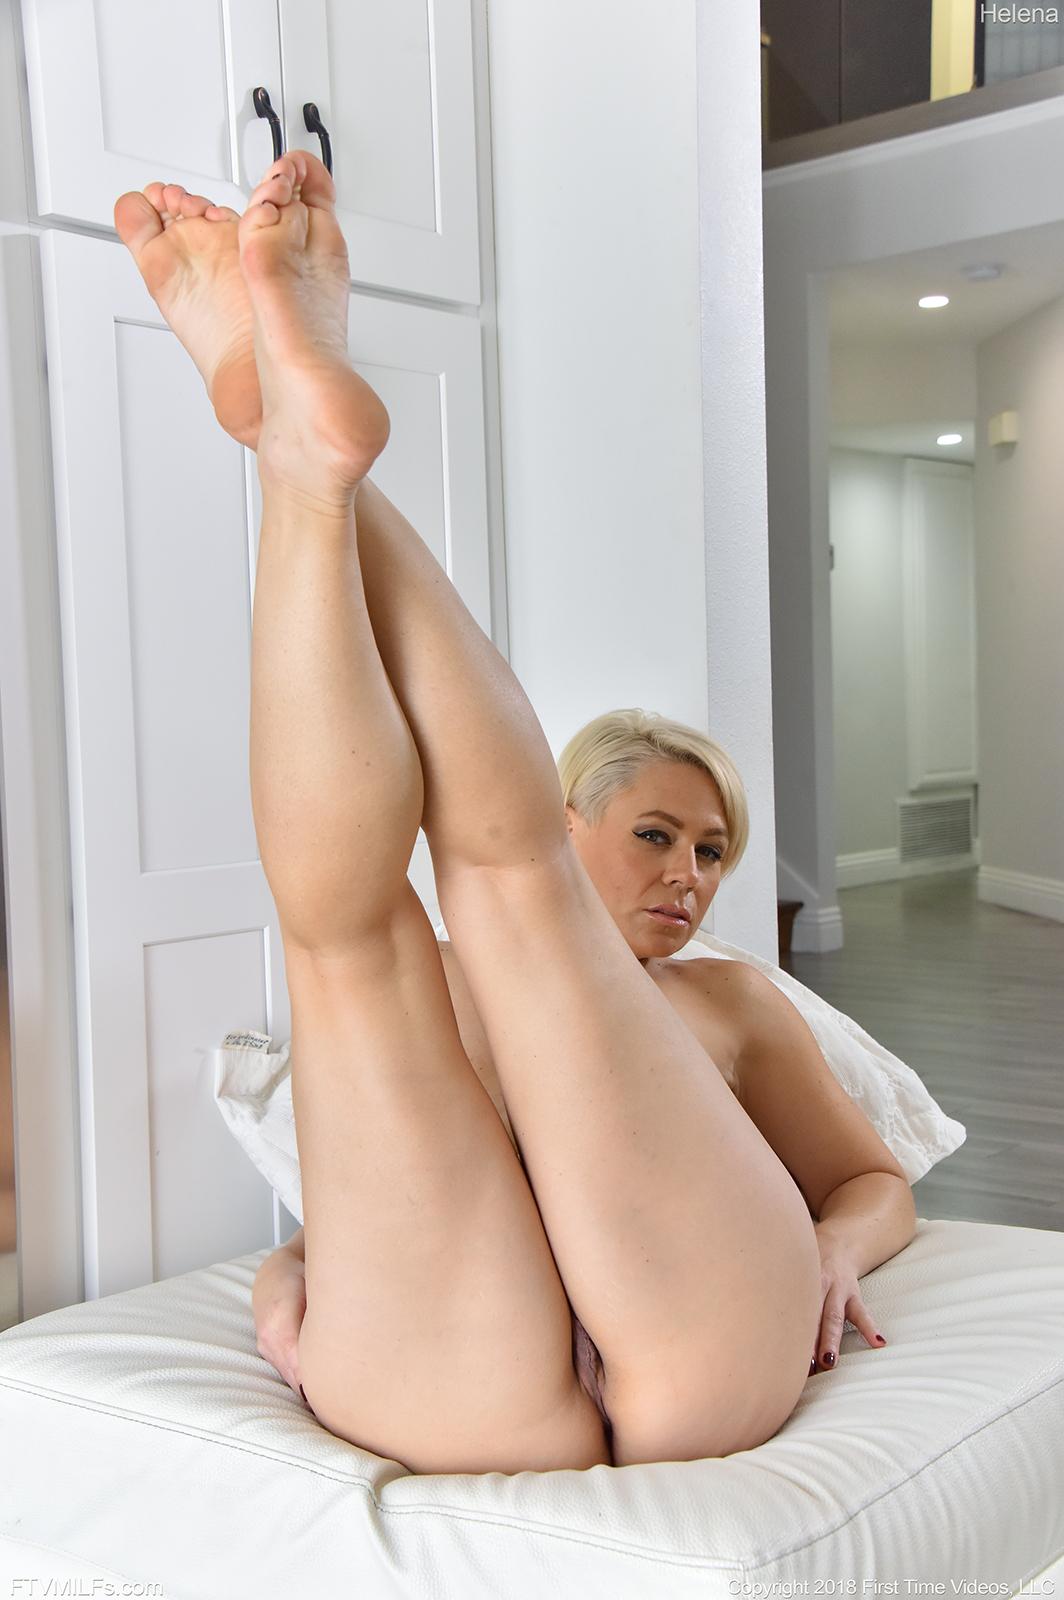 Short milfs pussy pics — img 15